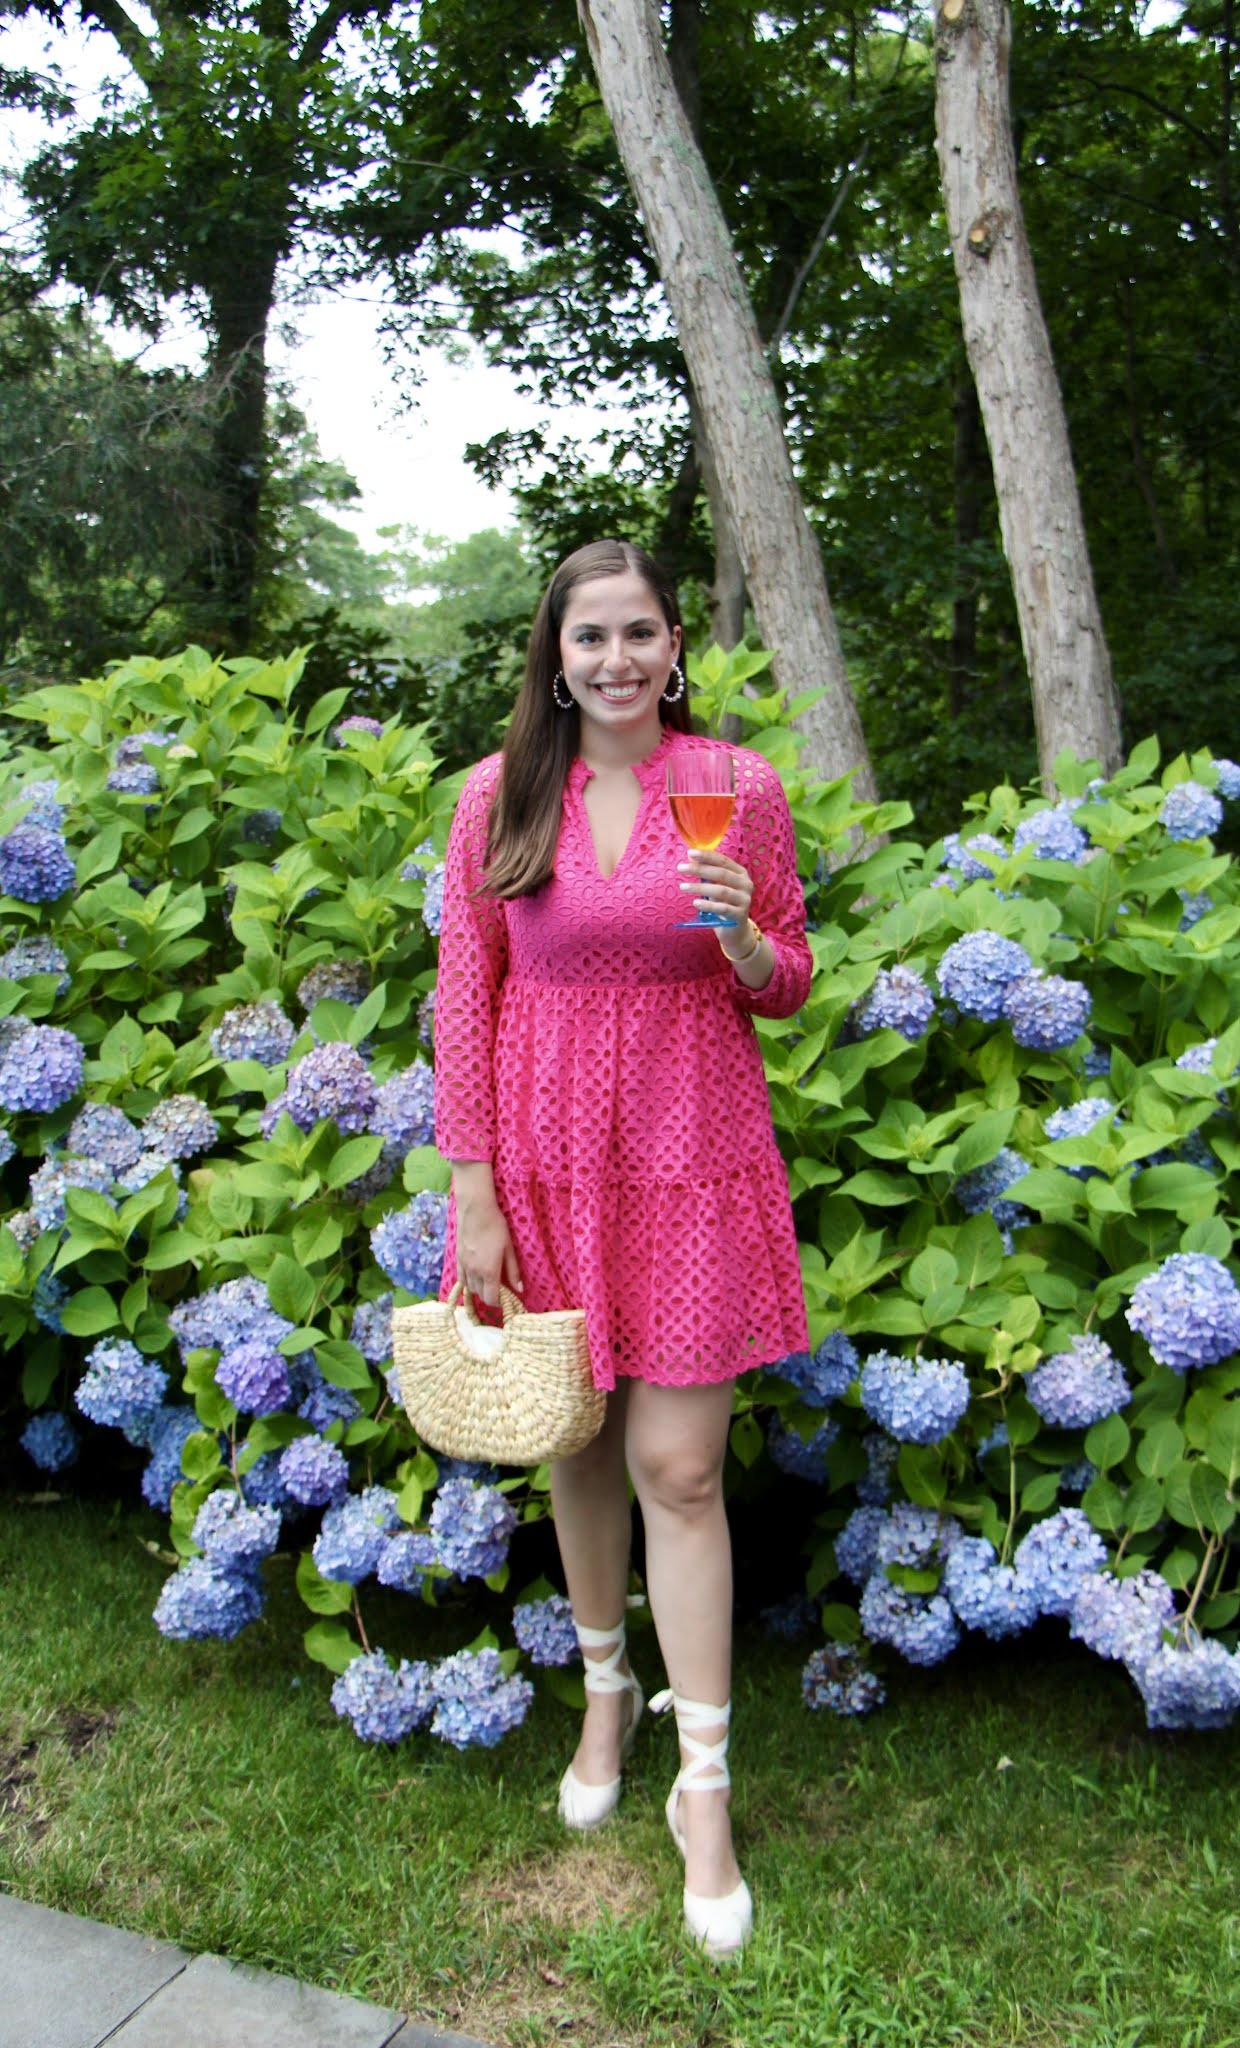 straw tote, hydrangeas, east hampton, soludos, wedges, pink dress, long island, summer